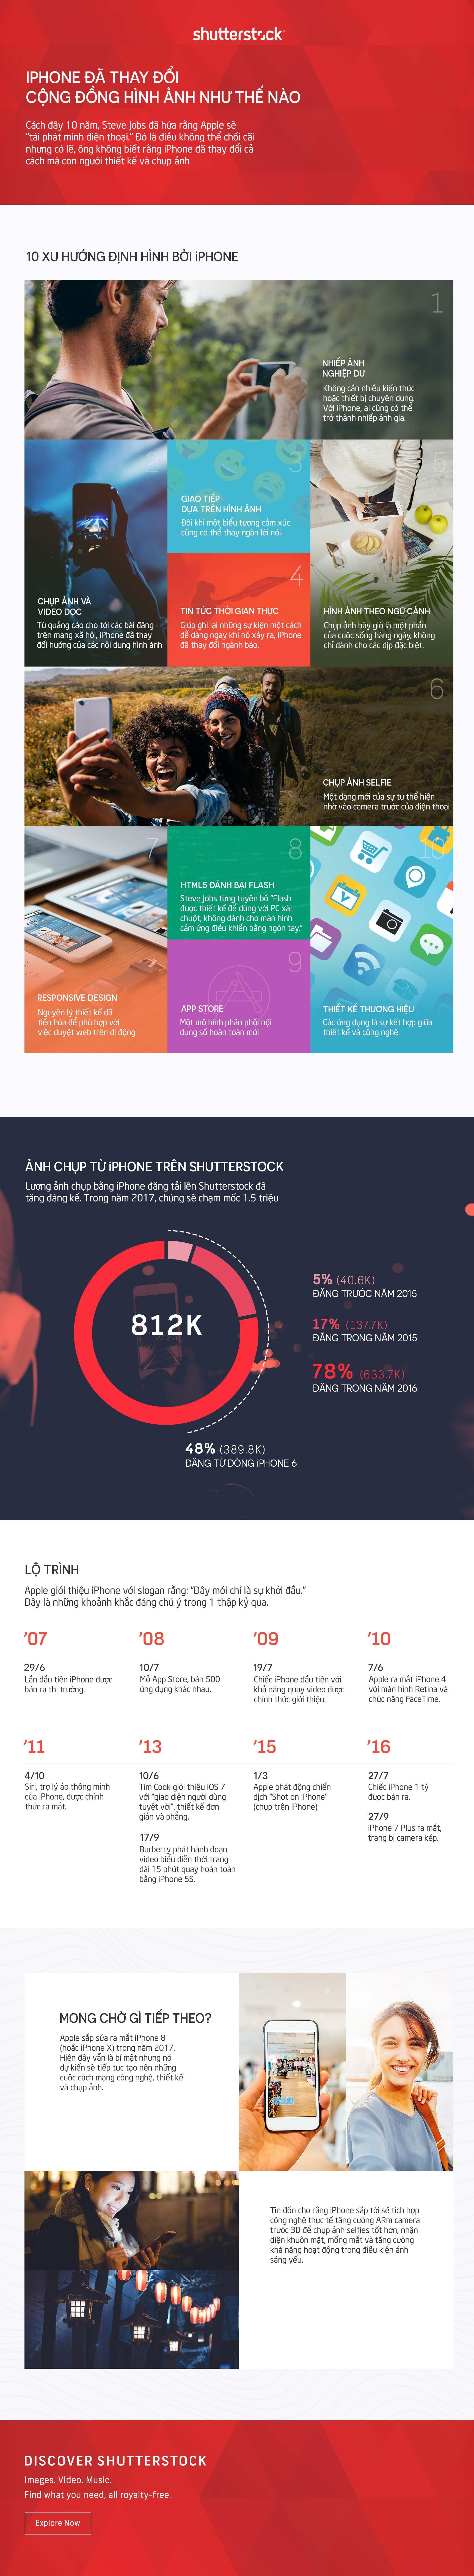 infographic_iPhone_10_nam_Tinhte.jpg